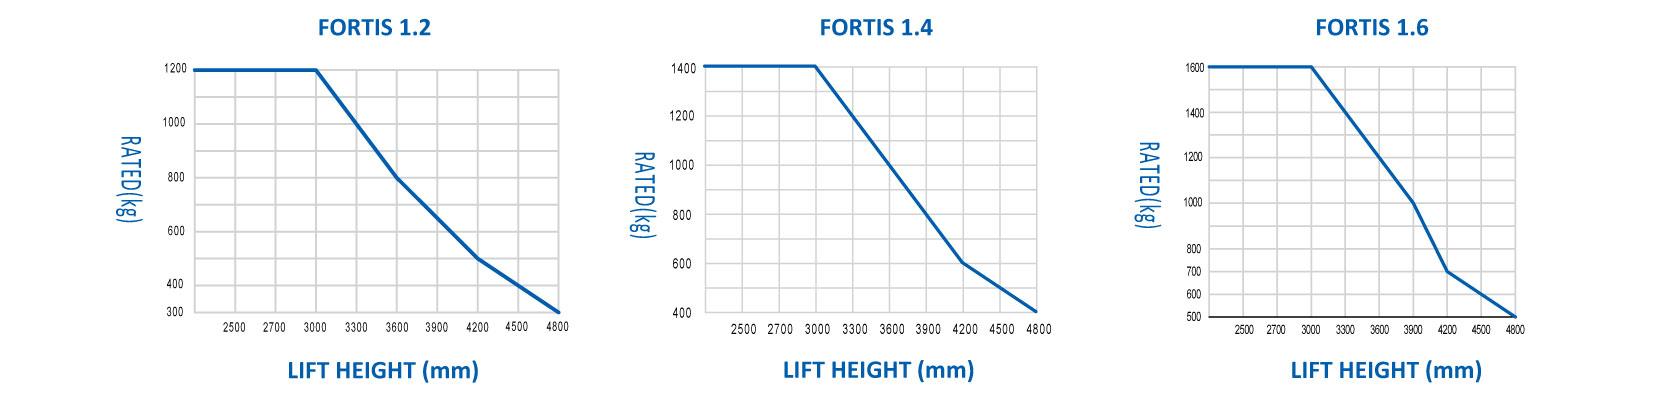 rated-capacity-graph.jpg (75 KB)